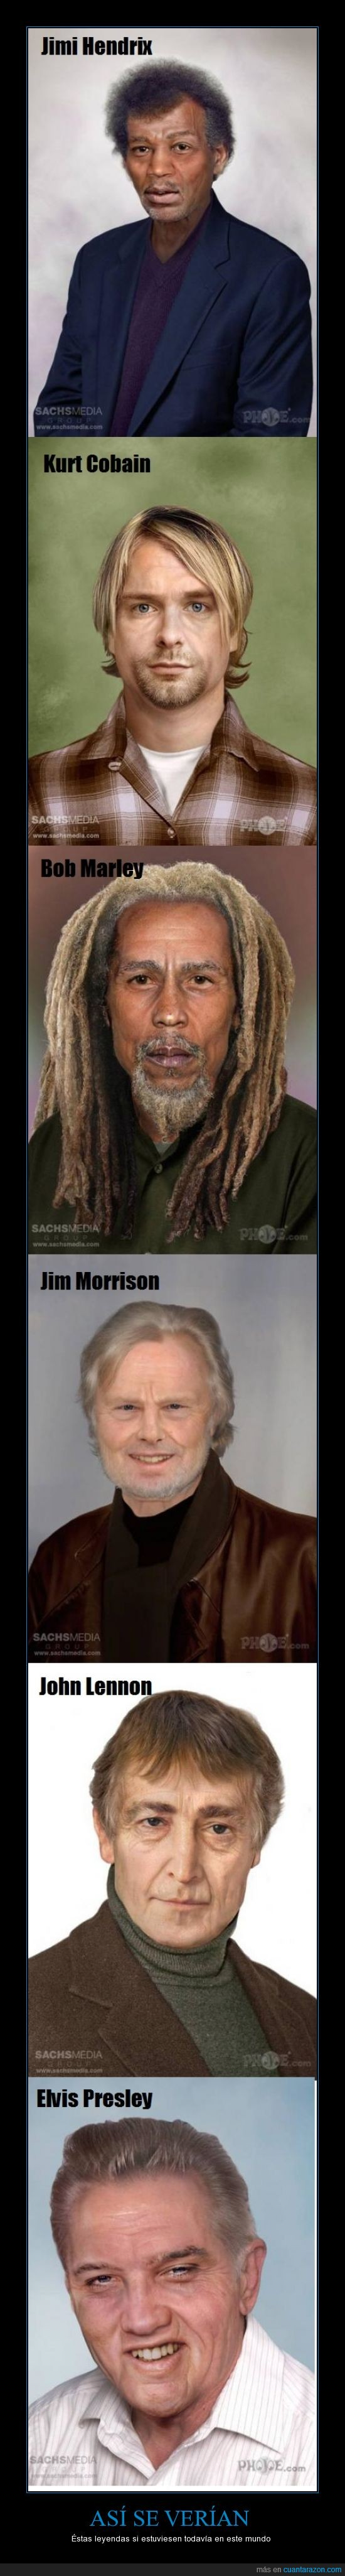 Bob Marley,Elvis Presley,Jim Morrison,Jimi Hendrix,John Lennon,Kurt Cobain